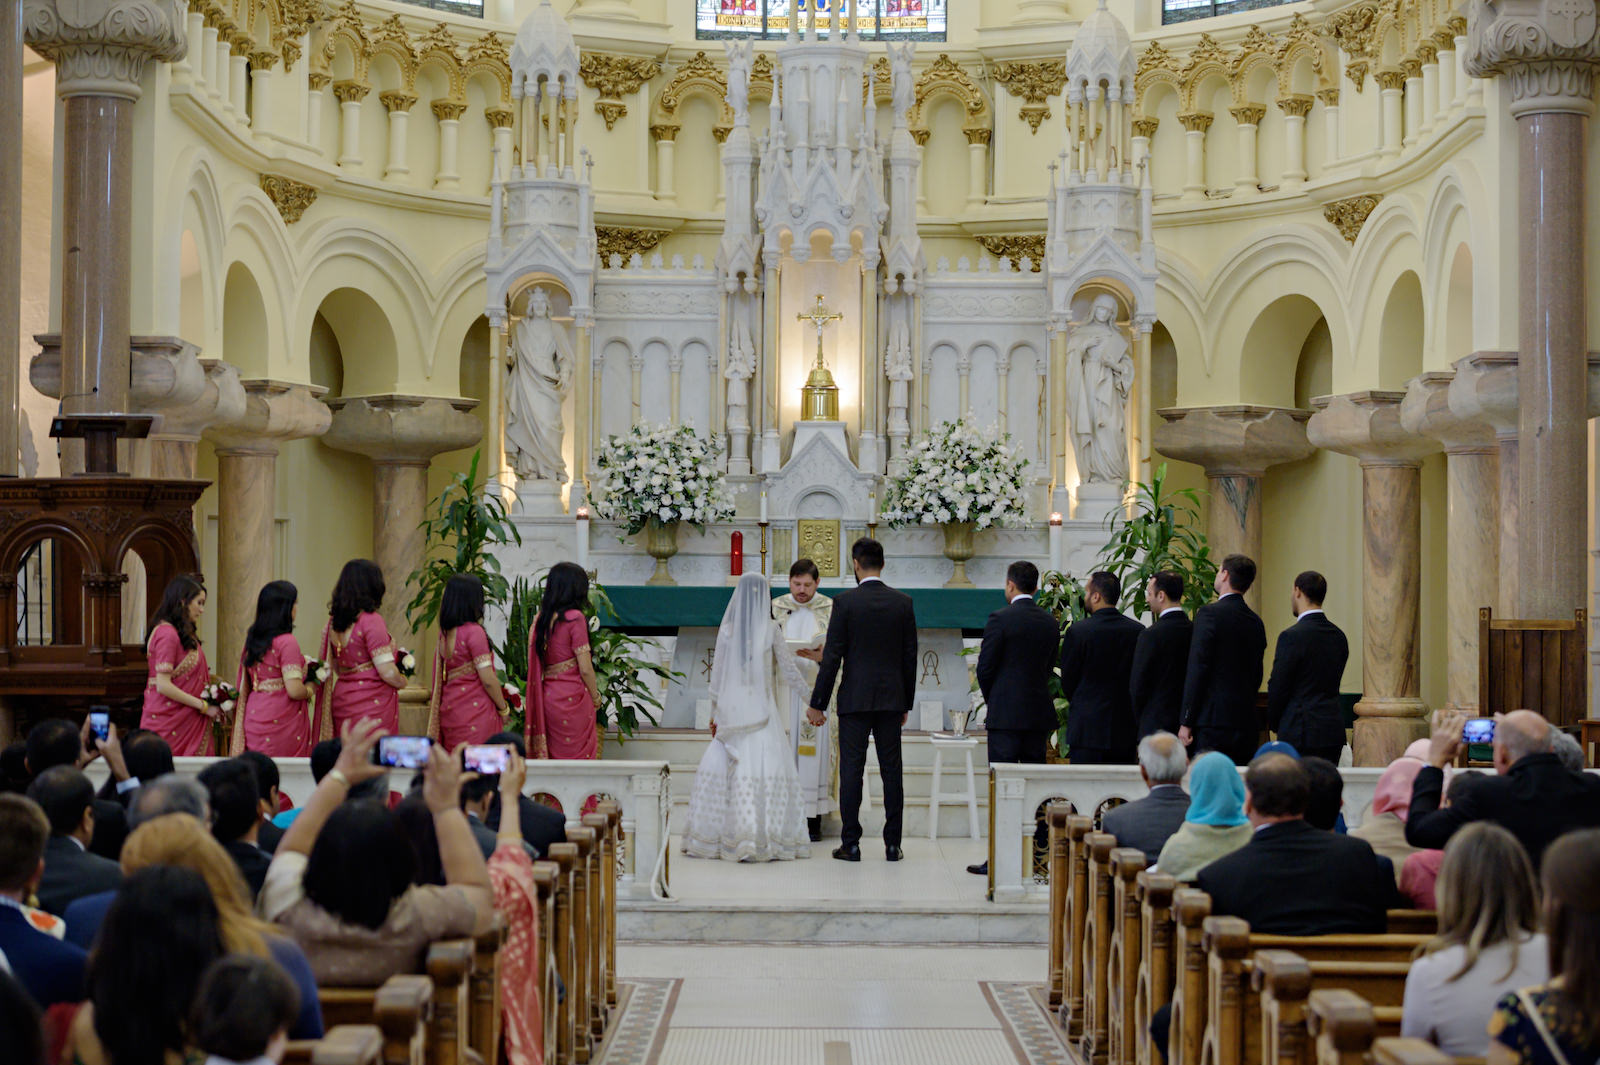 Florida Multicultural Wedding Ceremony | Catholic Wedding Ceremony at Sacred Heart Catholic Church